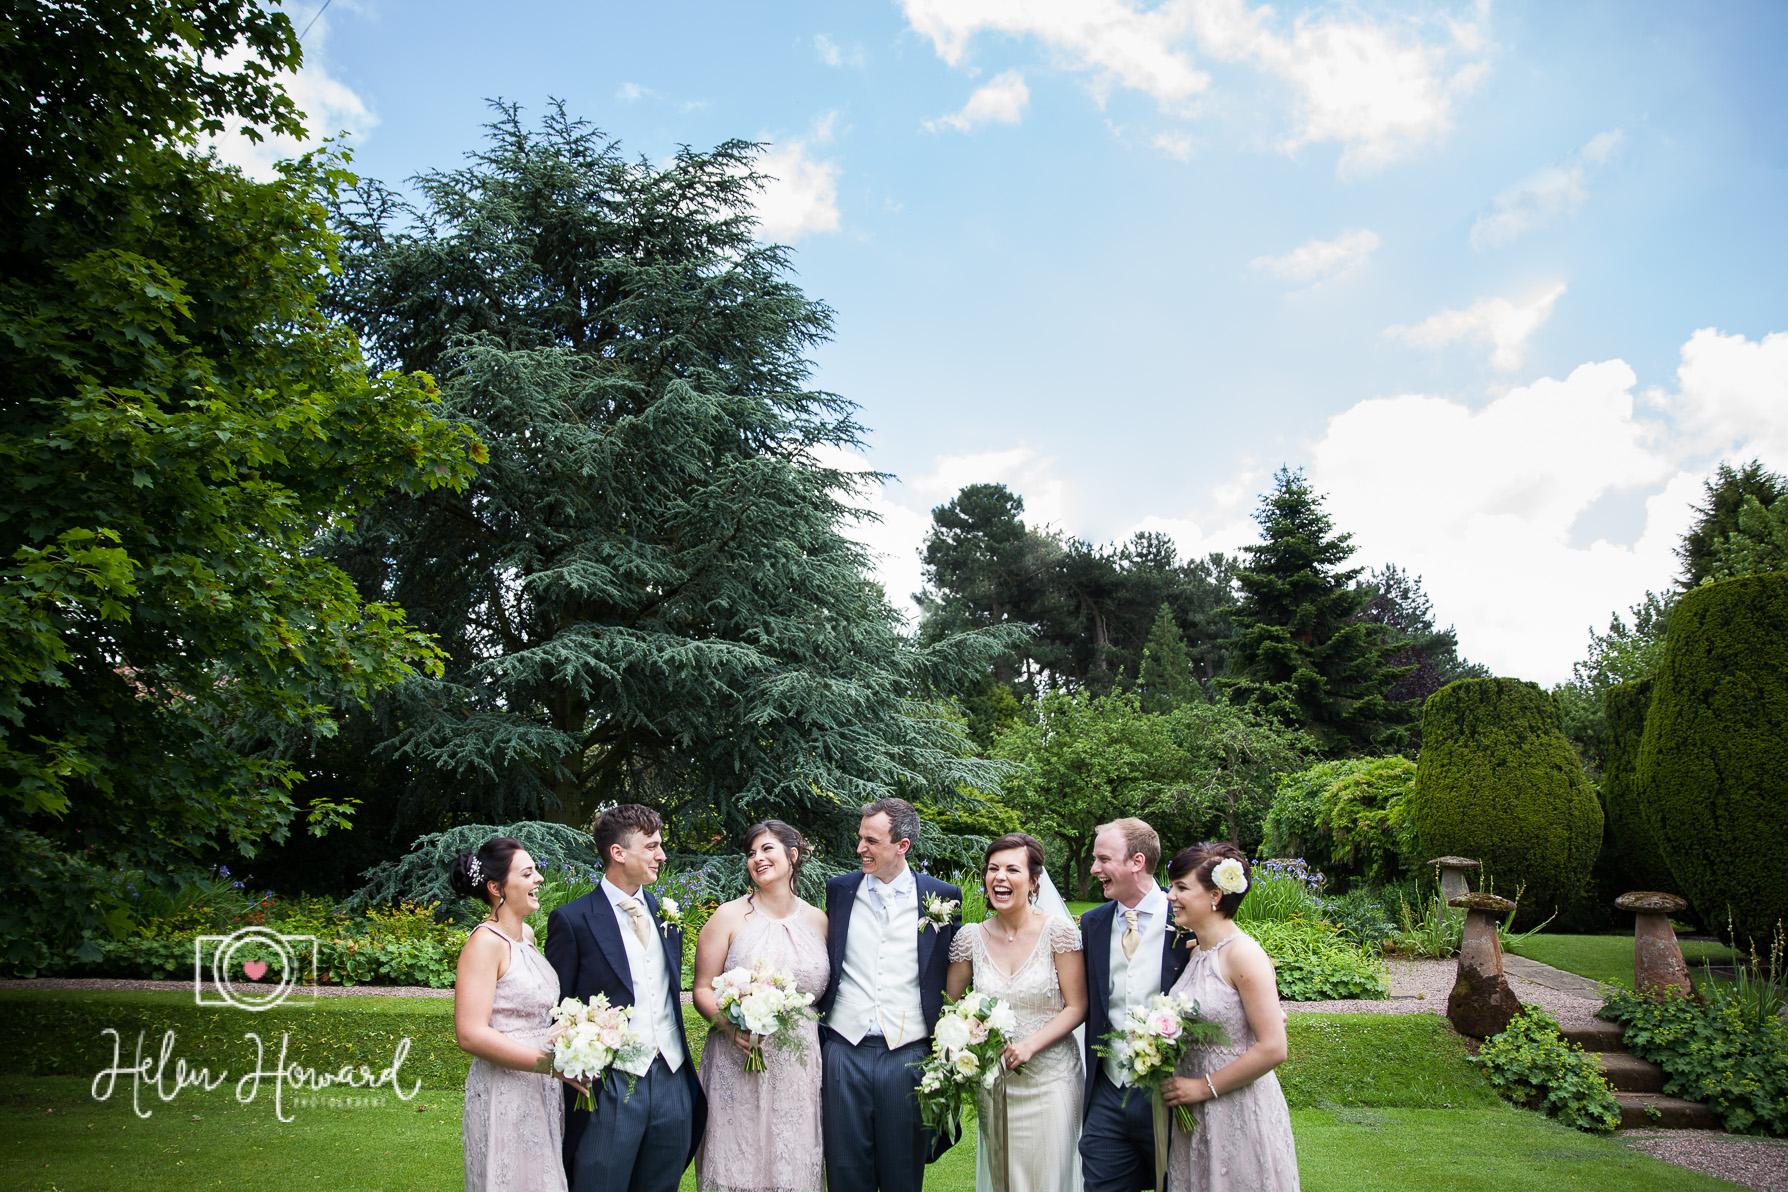 Helen Howard Photography Packington Moor Wedding-70.jpg